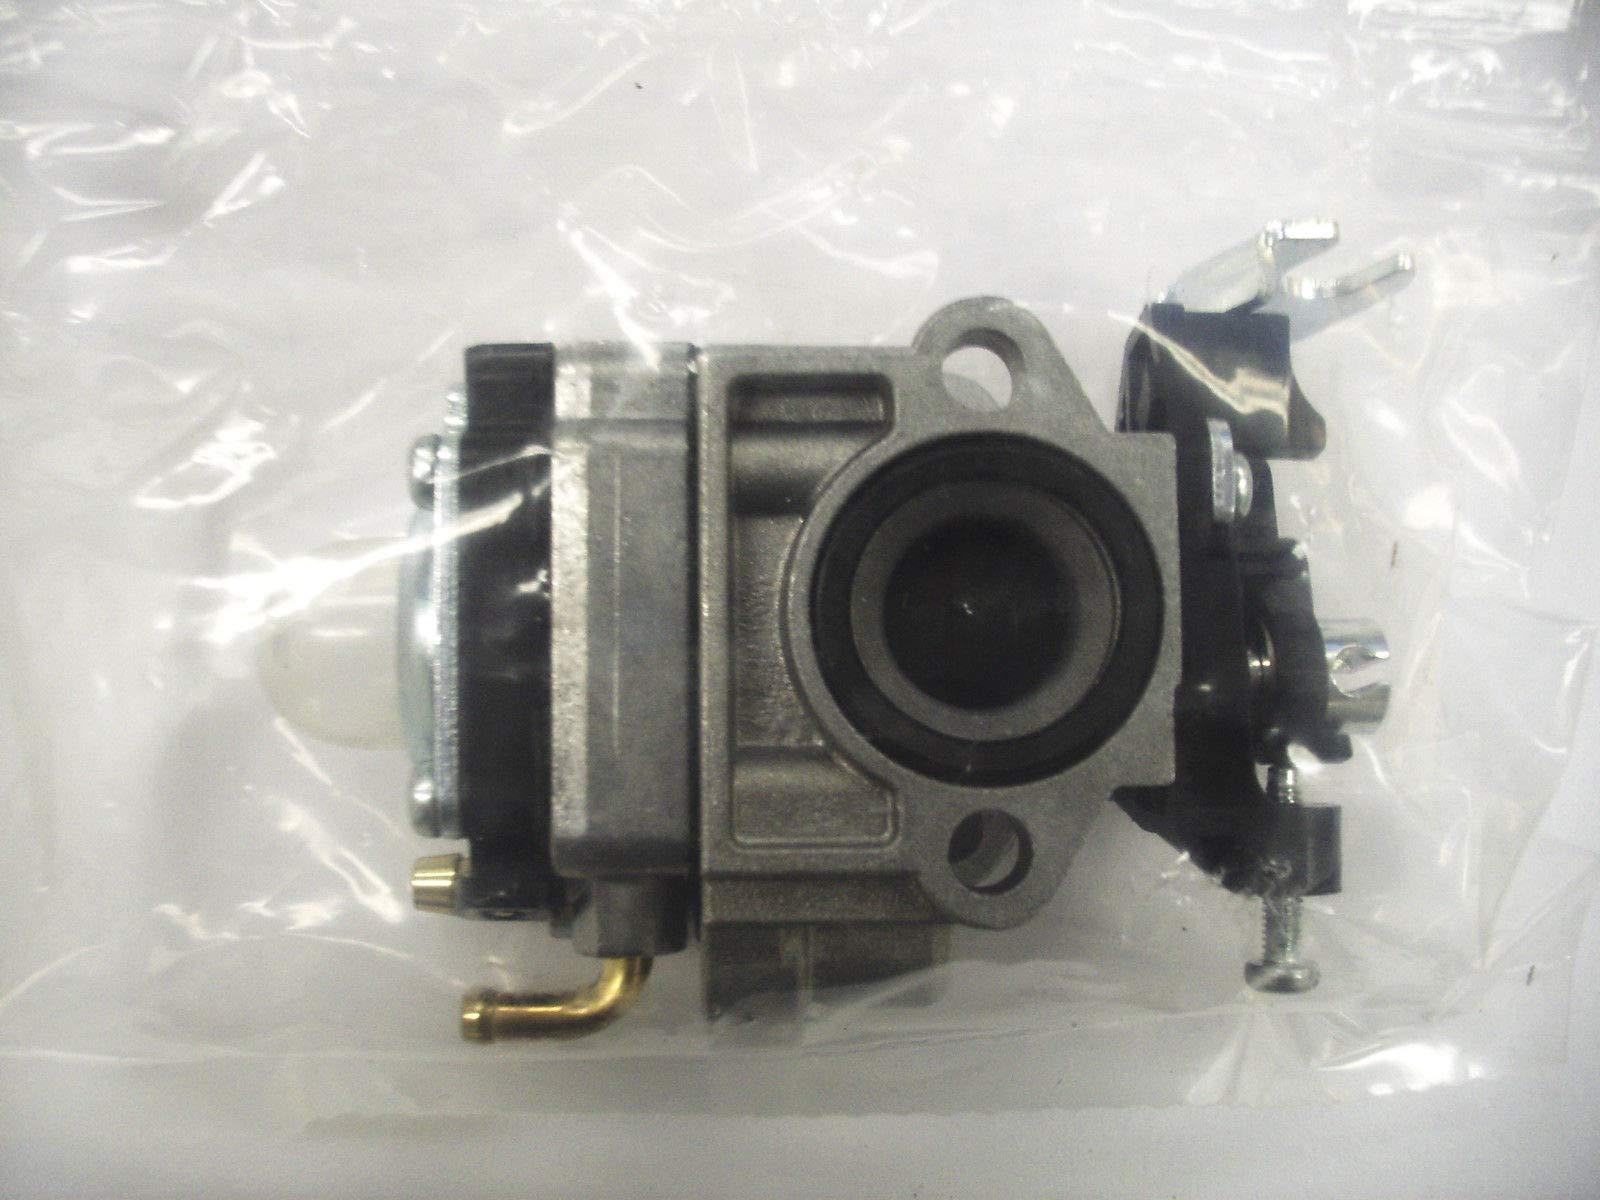 3 Pack Genuine Echo WYK-233A A021001340 Carburetor Fits PPF-280 PPT-280 Pole Saws PE-280 SRM-280 Trimmers